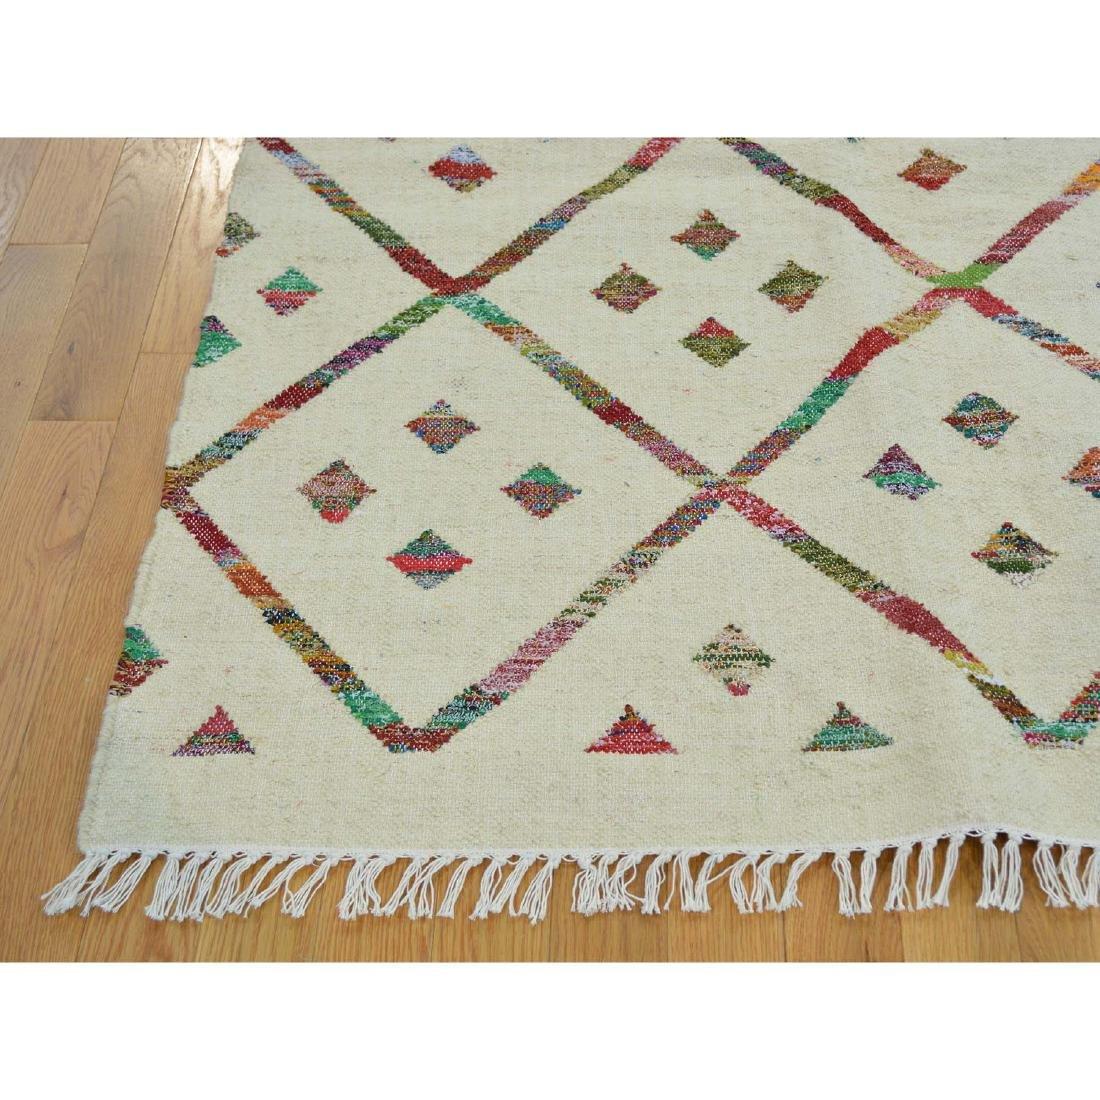 Hand Woven Flat Weave Wool Sari Silk Durie Rug 8.1x9.10 - 3